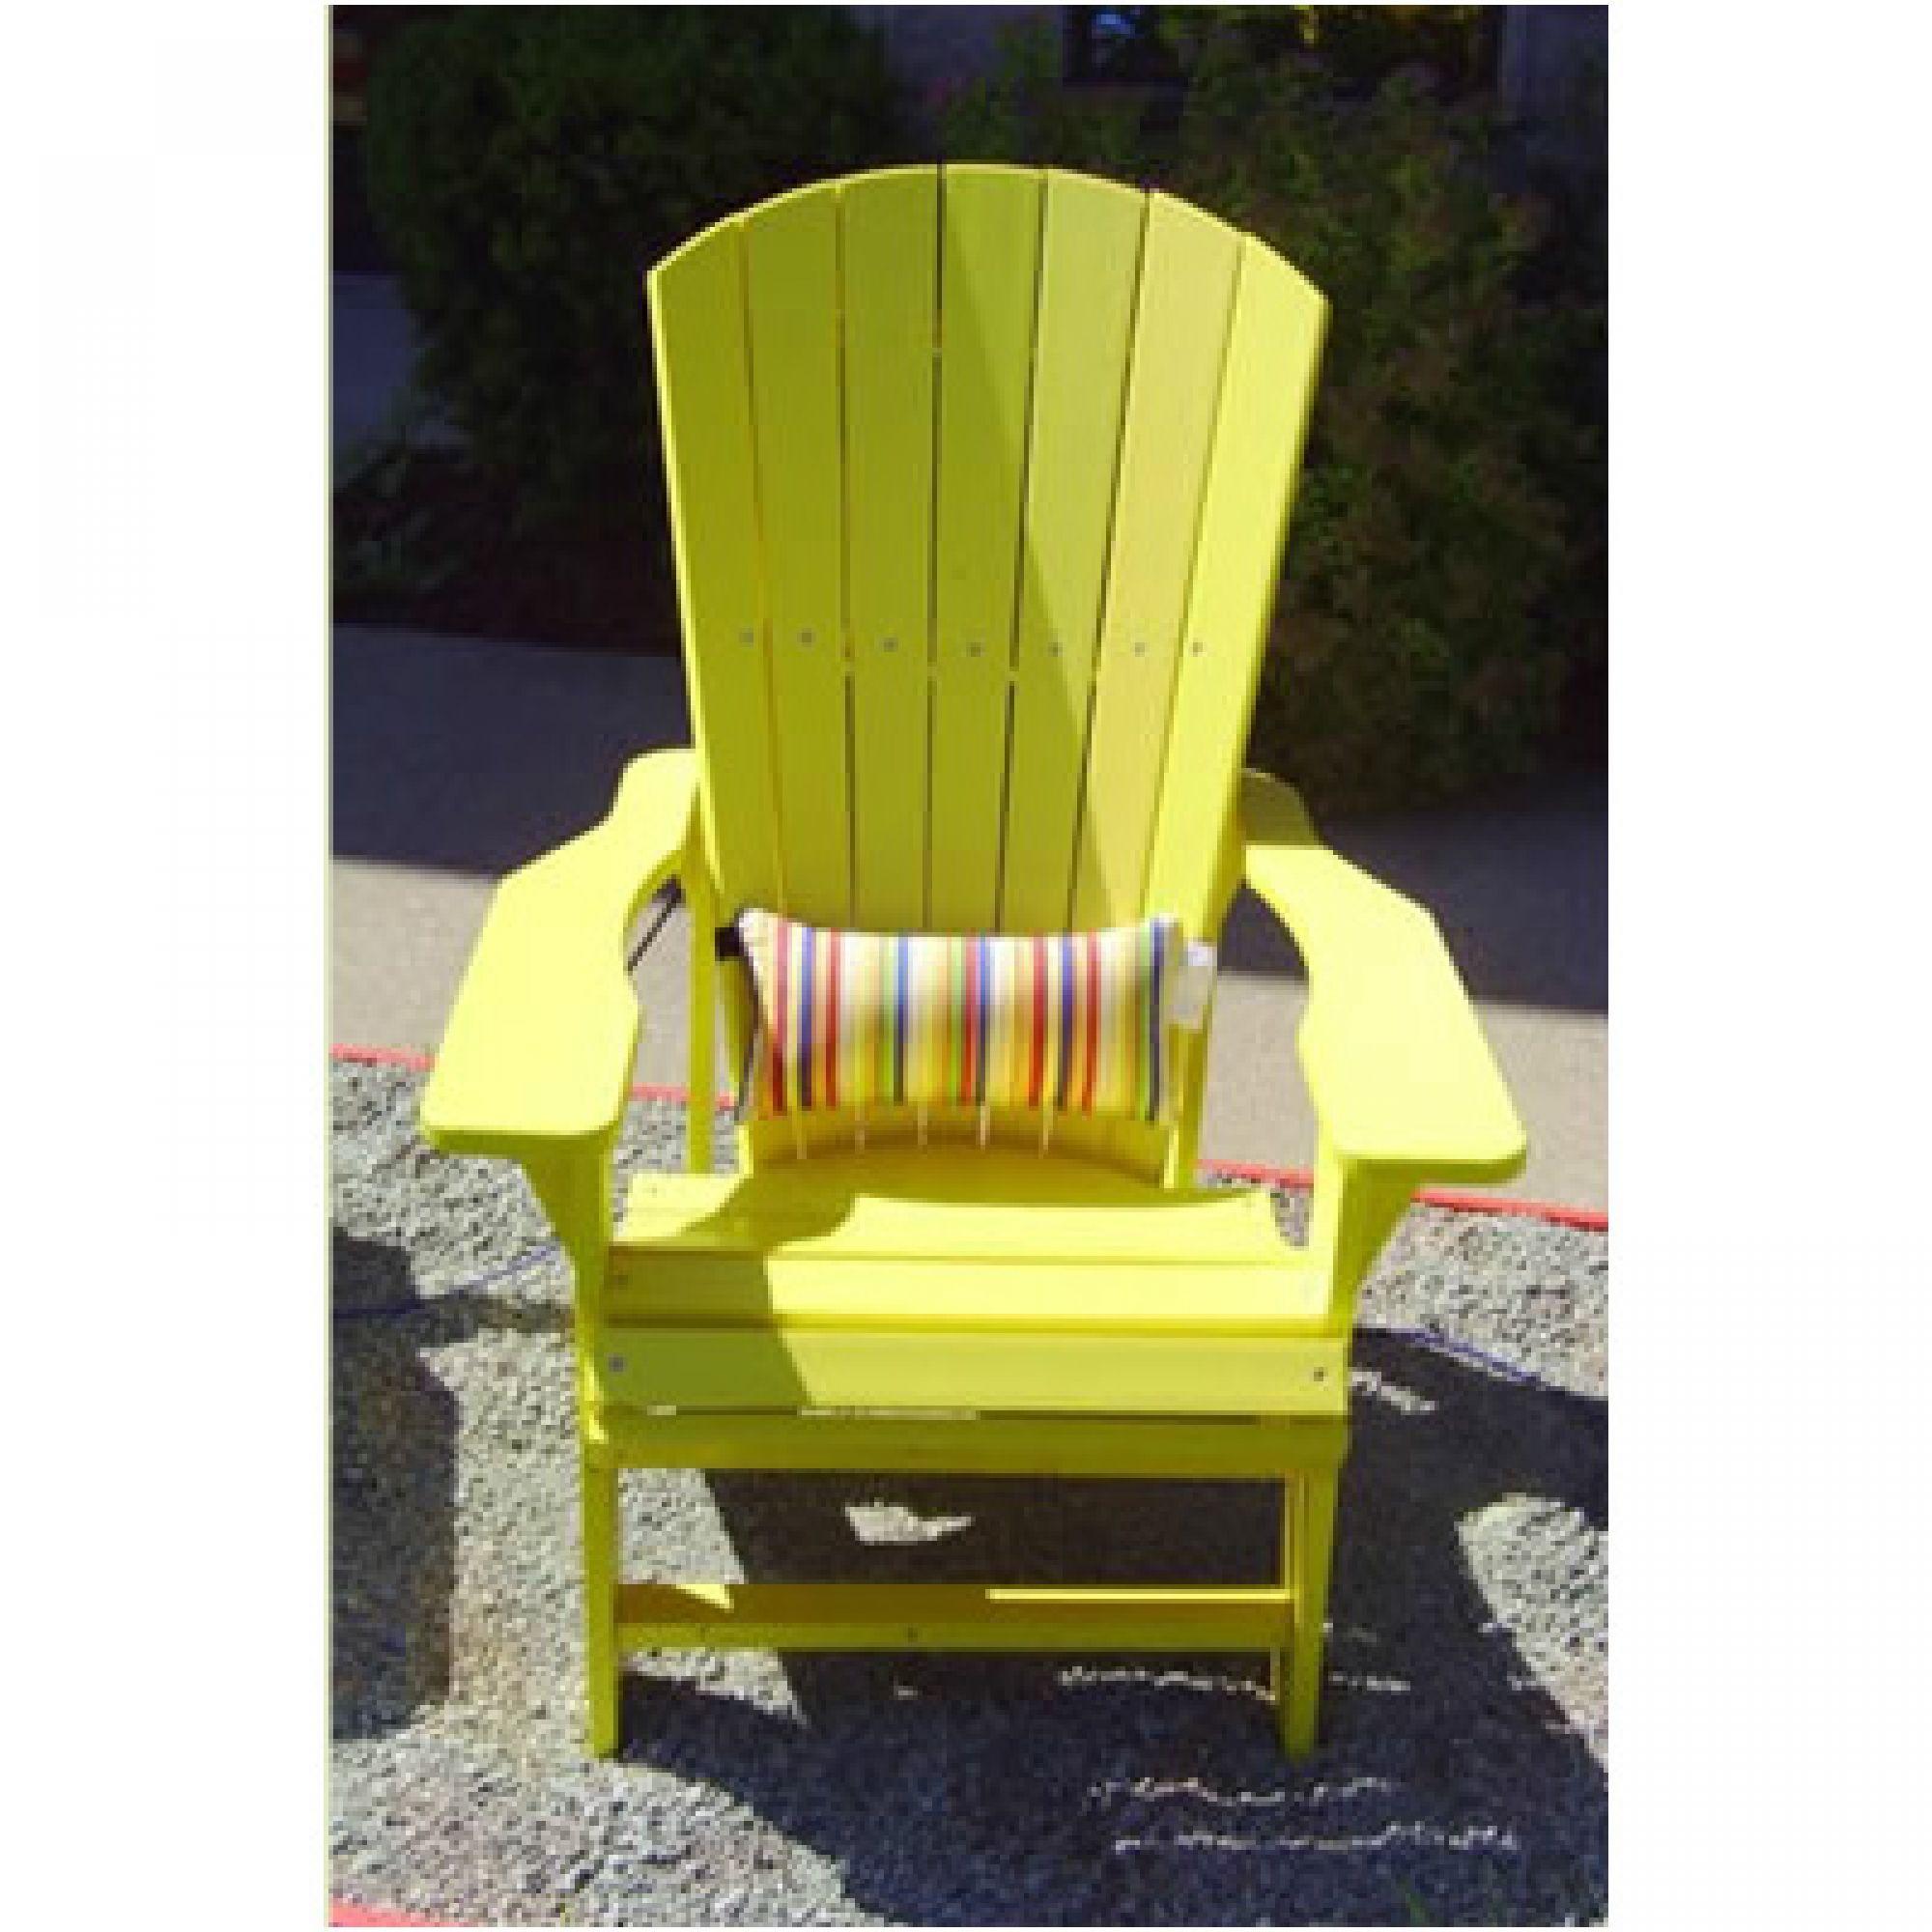 Amusing Lumbar Cushions For Adirondack Chairs With Fresh Green